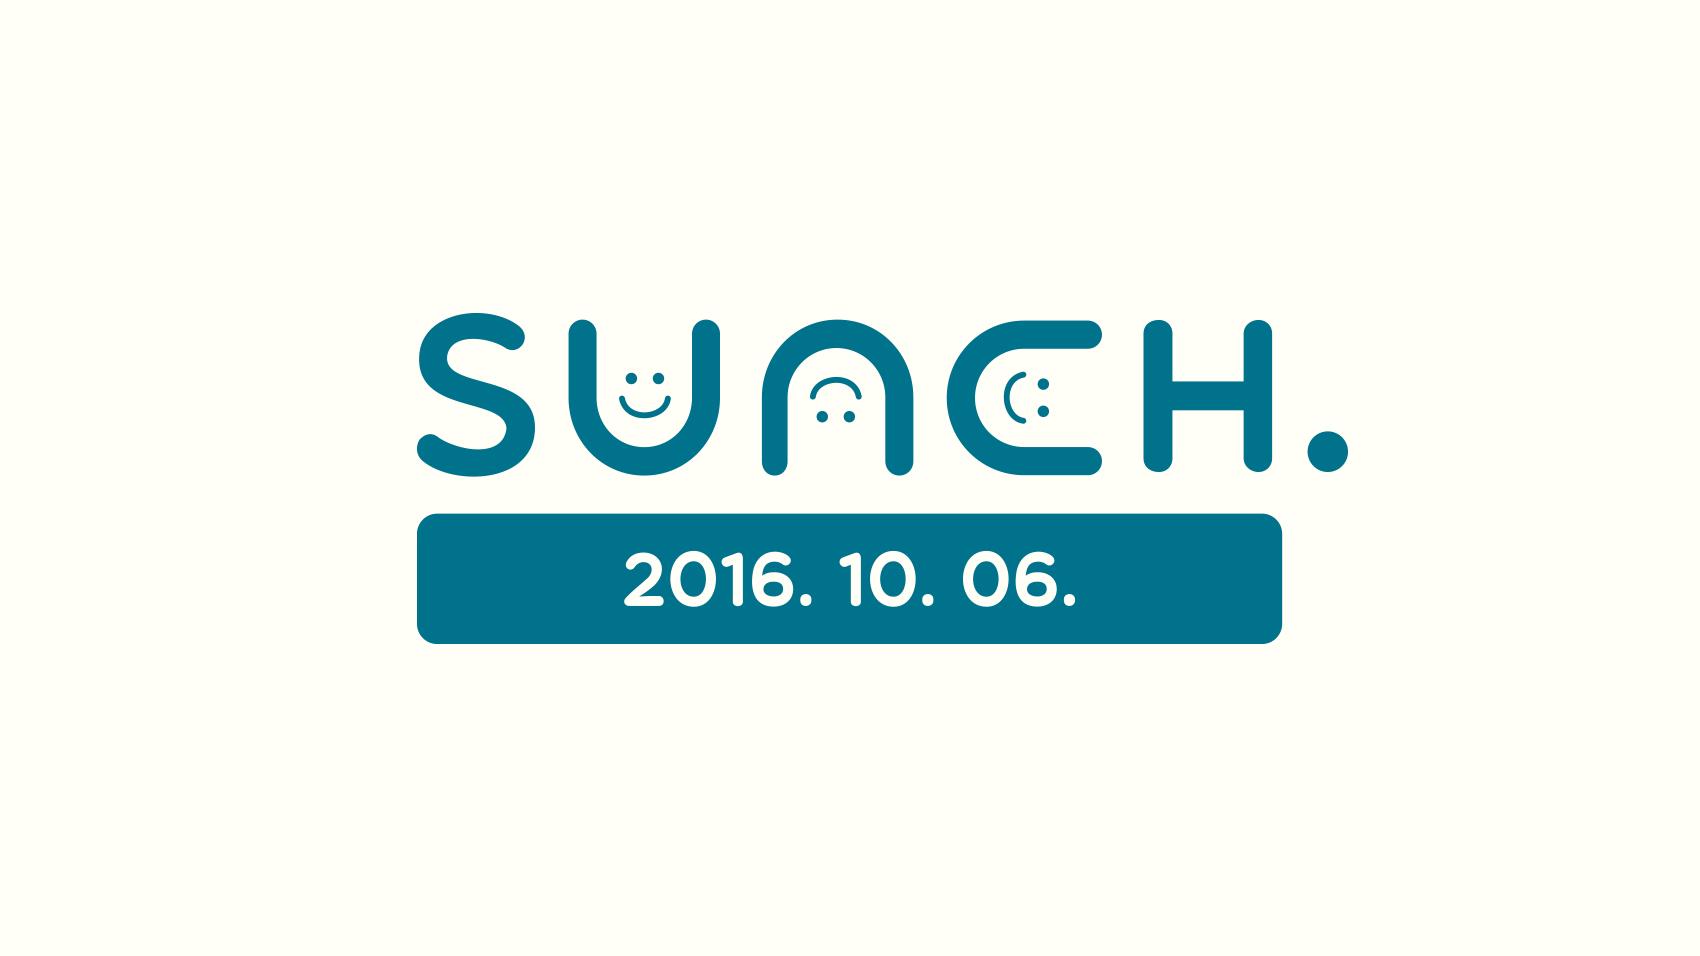 sunchロゴの日付とカラーが違うバージョン